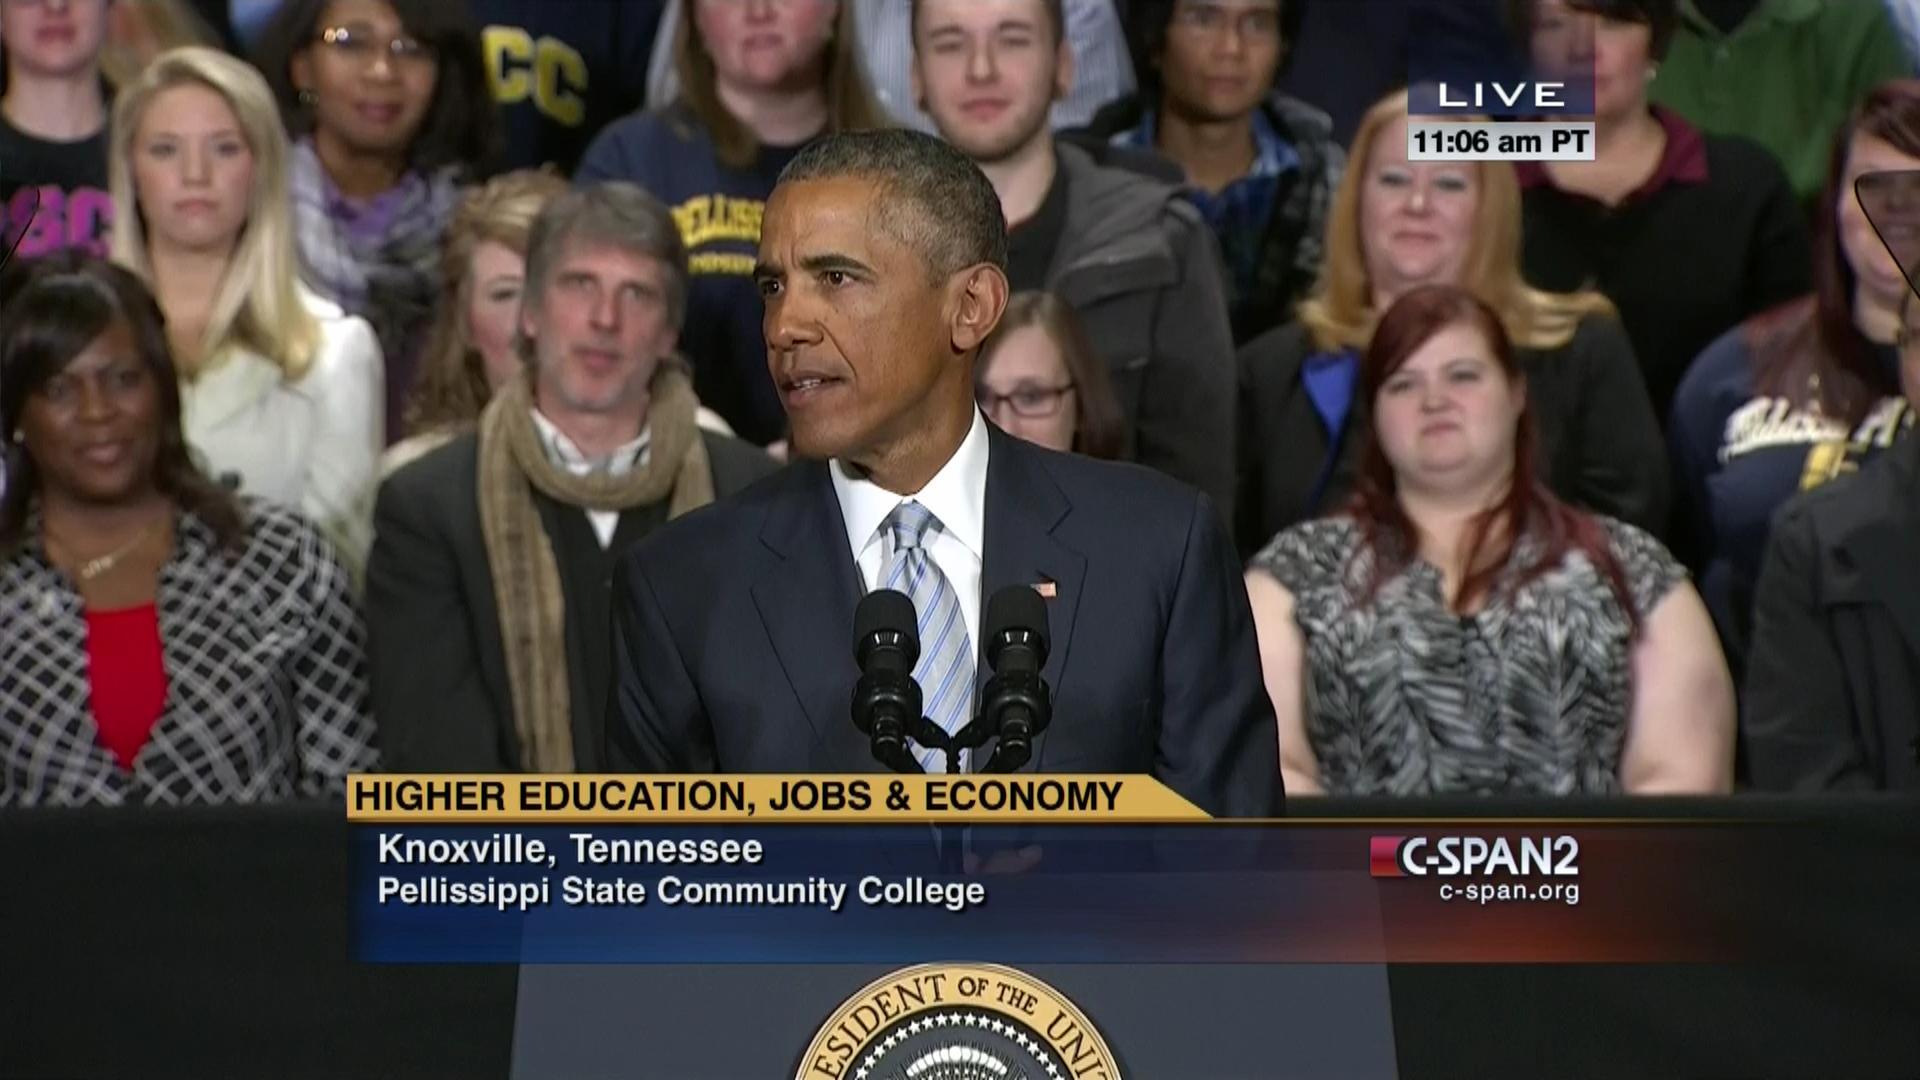 President Obama Vice President Biden Remarks Tennessee | C-SPAN.org